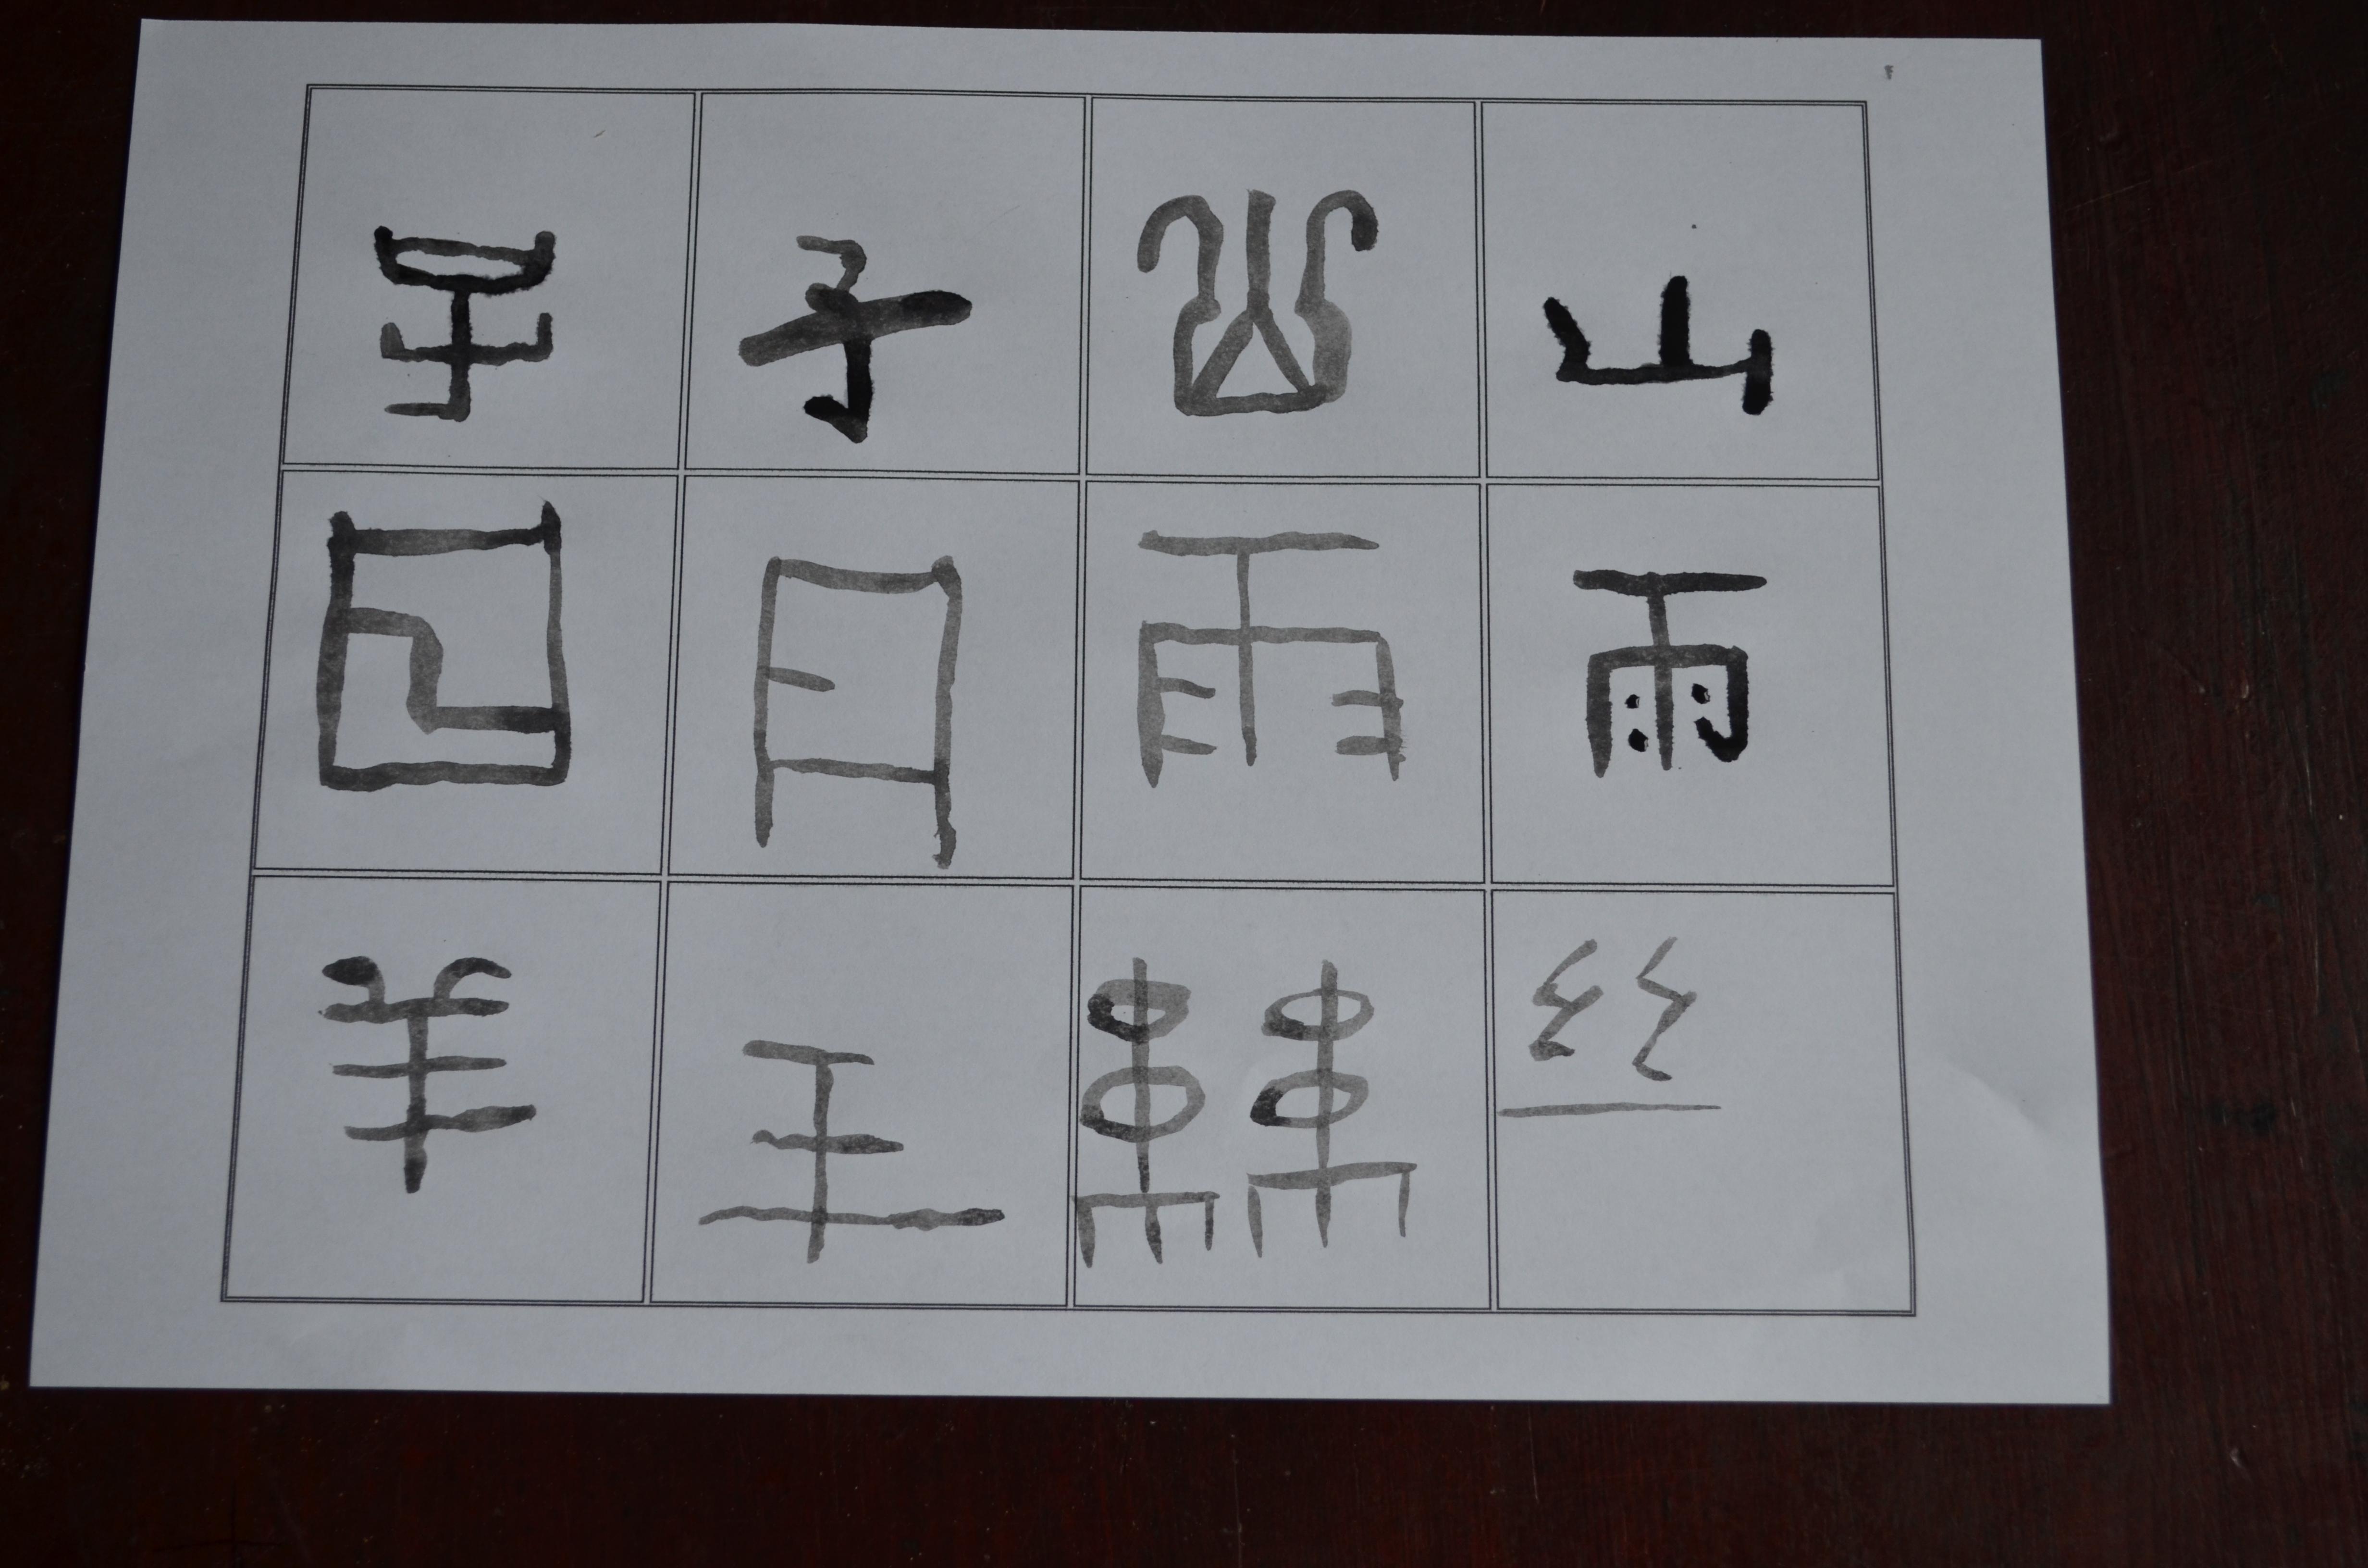 Pinyin romanization